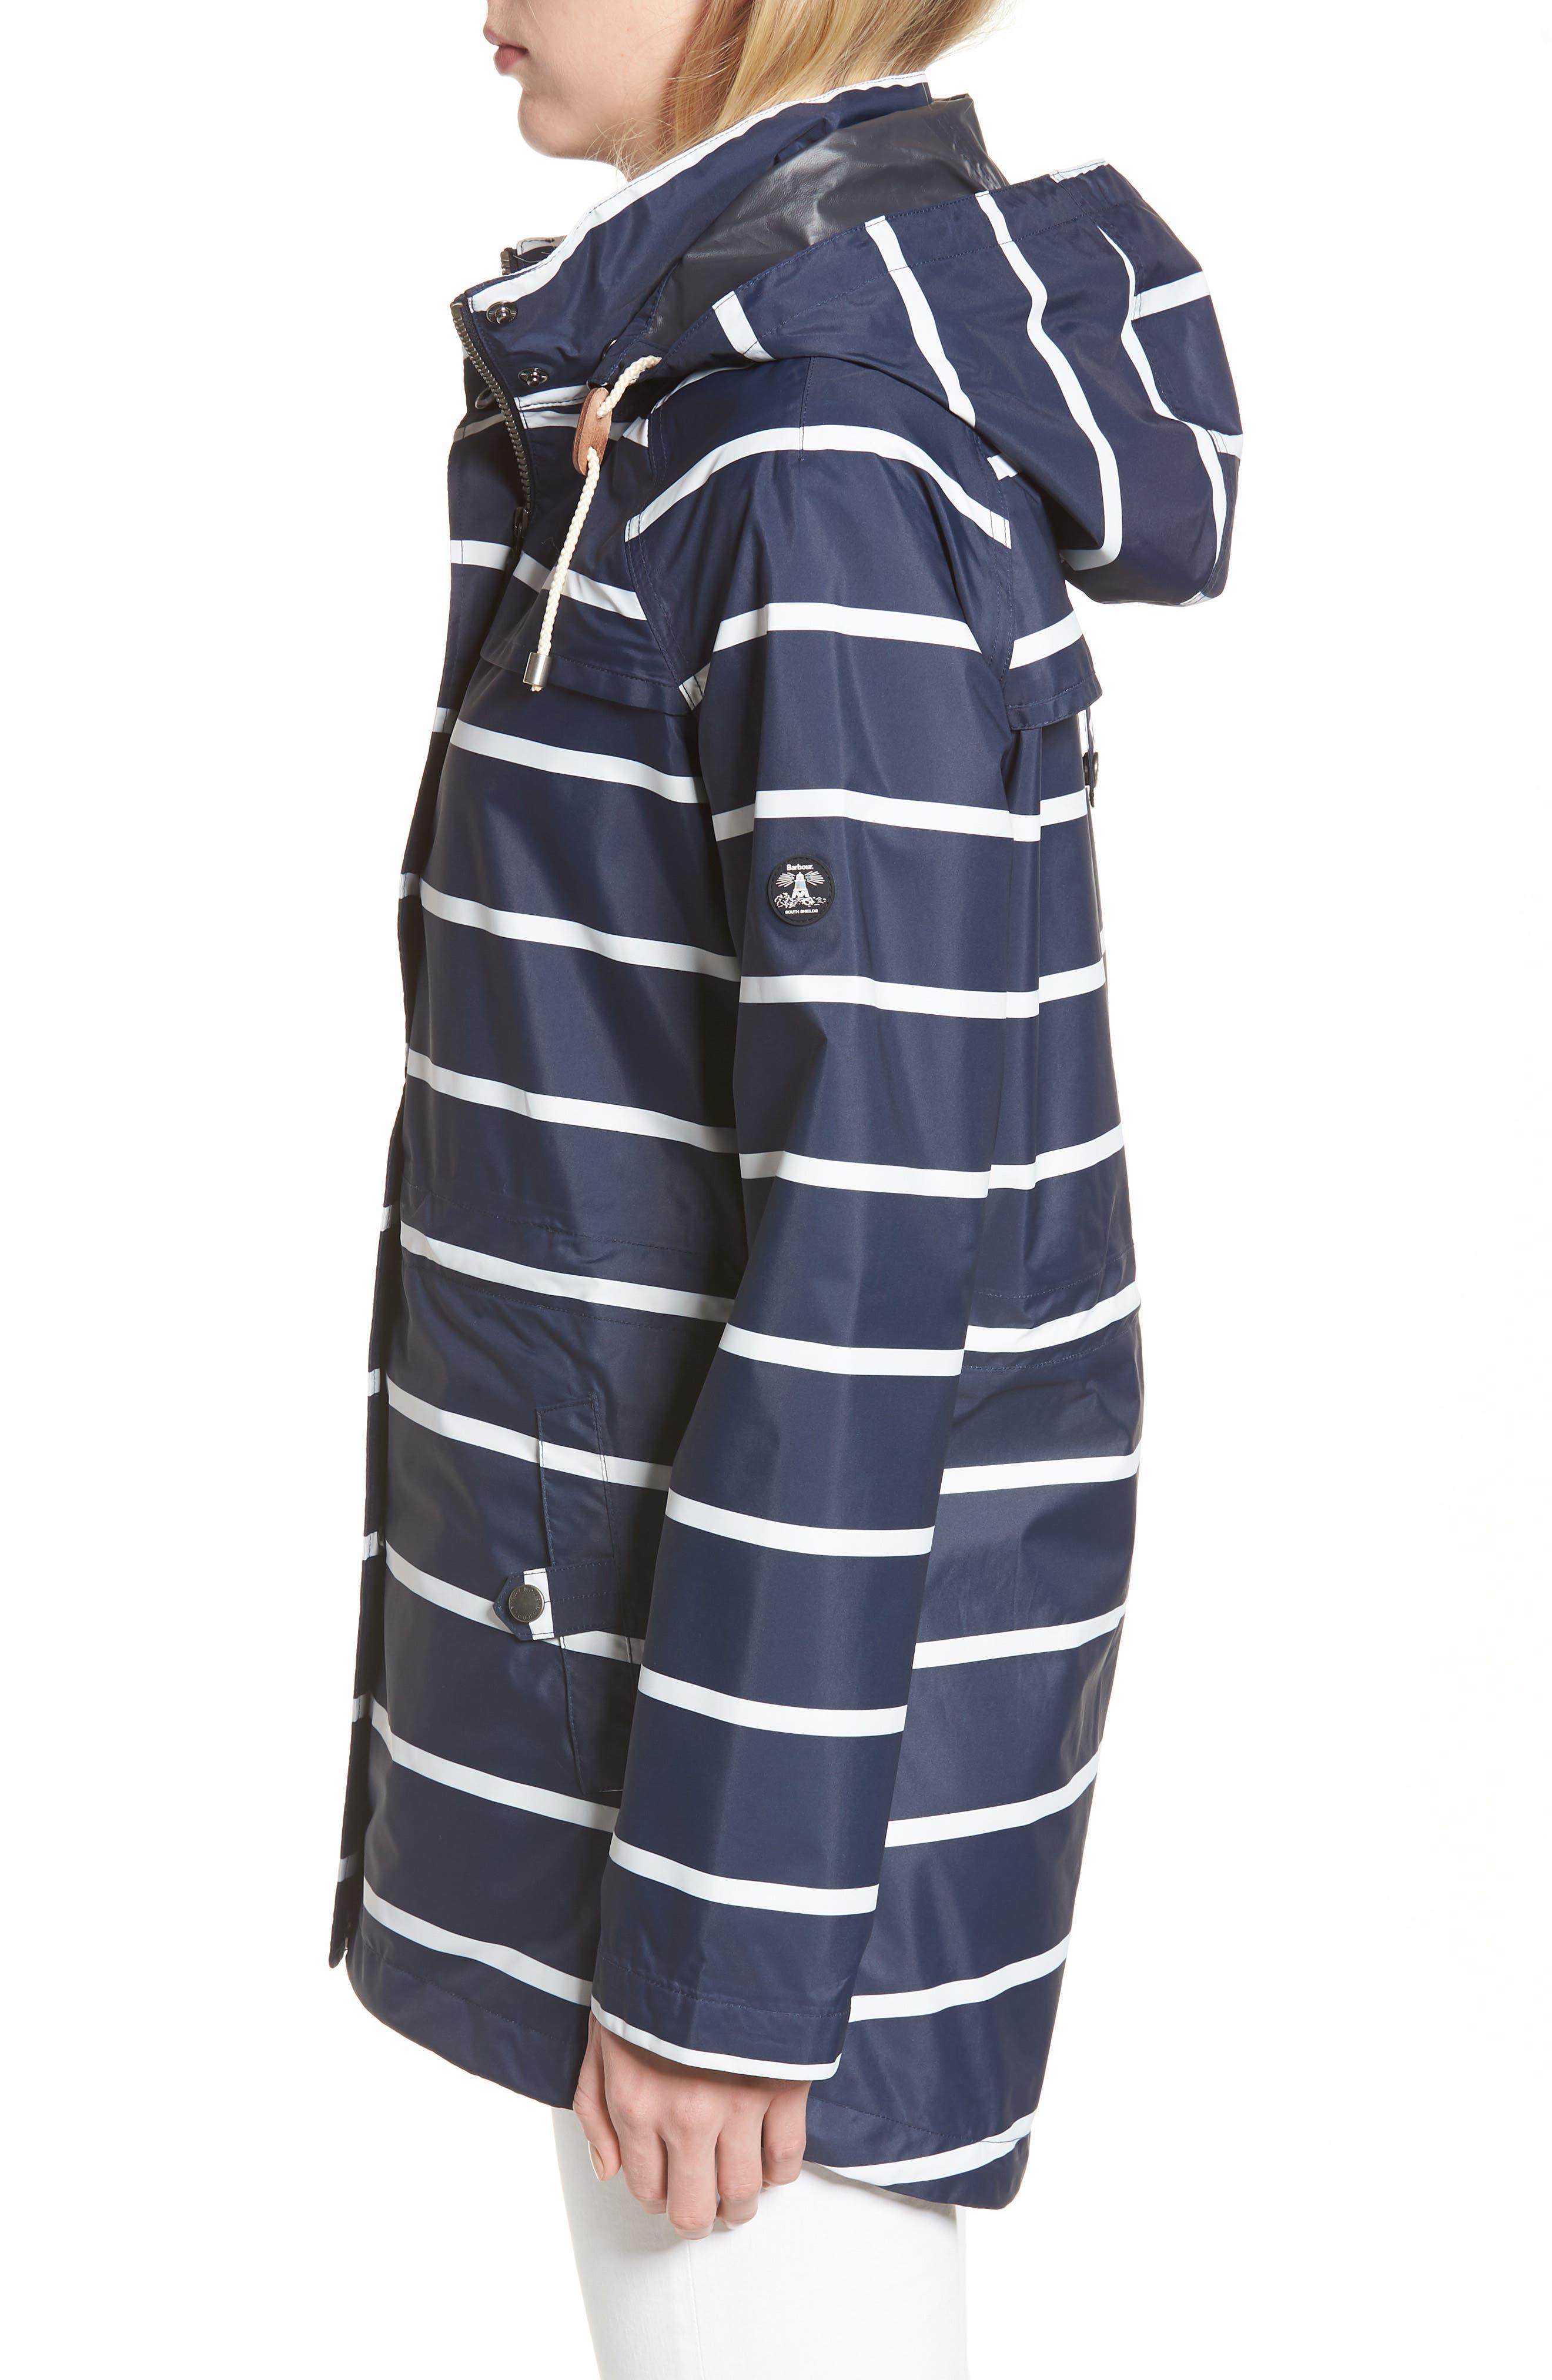 Holliwell Stripe Hooded Jacket,                             Alternate thumbnail 3, color,                             410